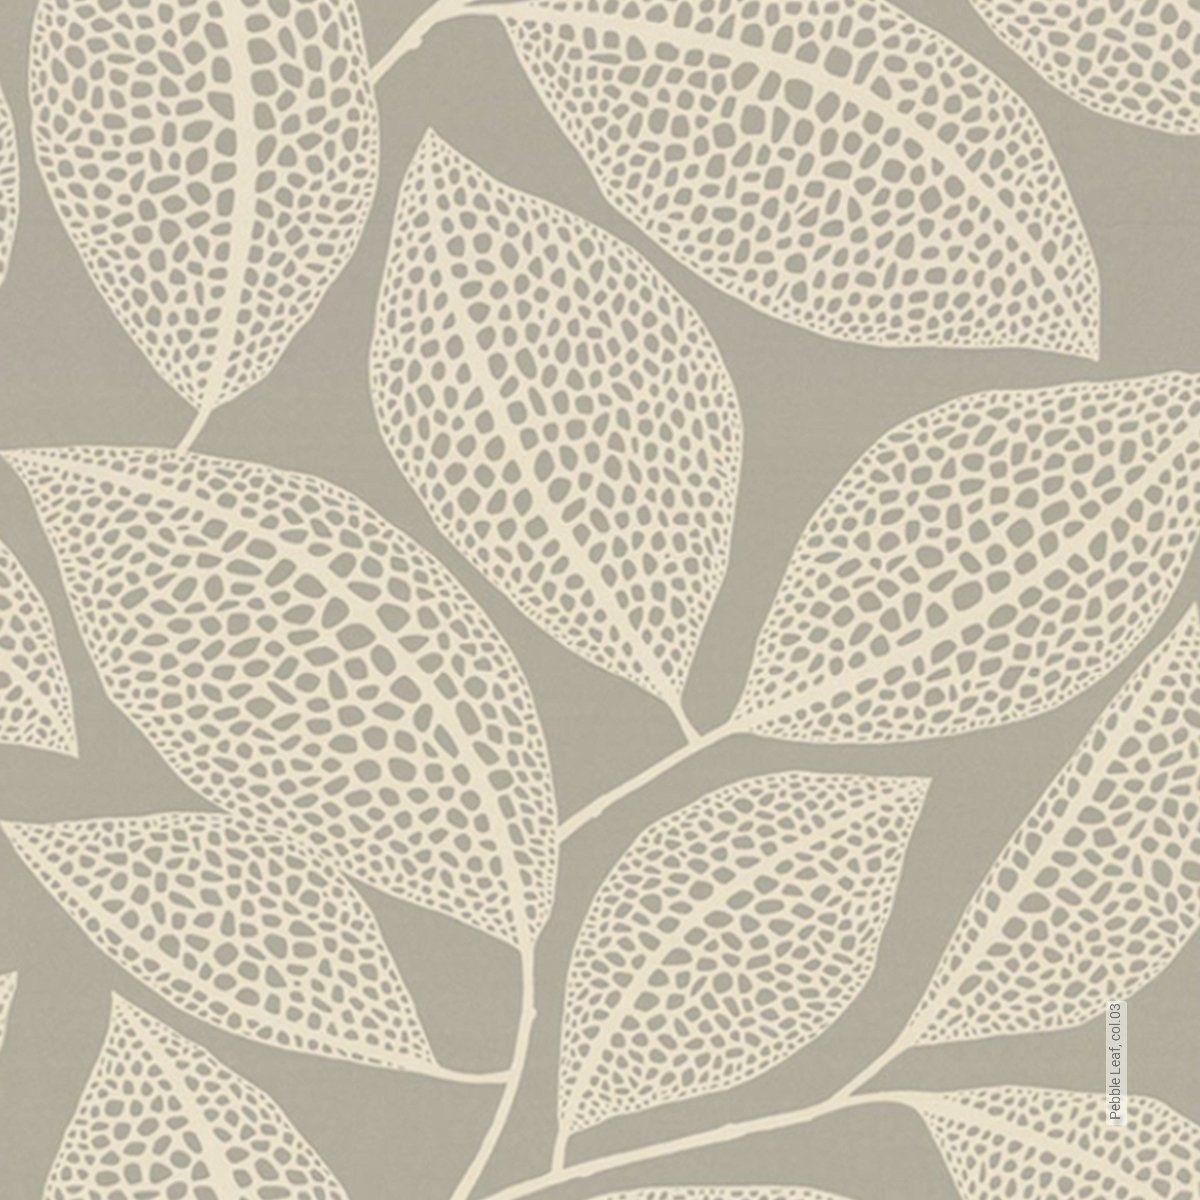 Tapete Pebble Leaf Col 03 Die Tapetenagentur Aus Den Kollektionen Florale Muster Moderne Muster Florale Muster Blatter Tapeten Tapeten Tapeten Floral